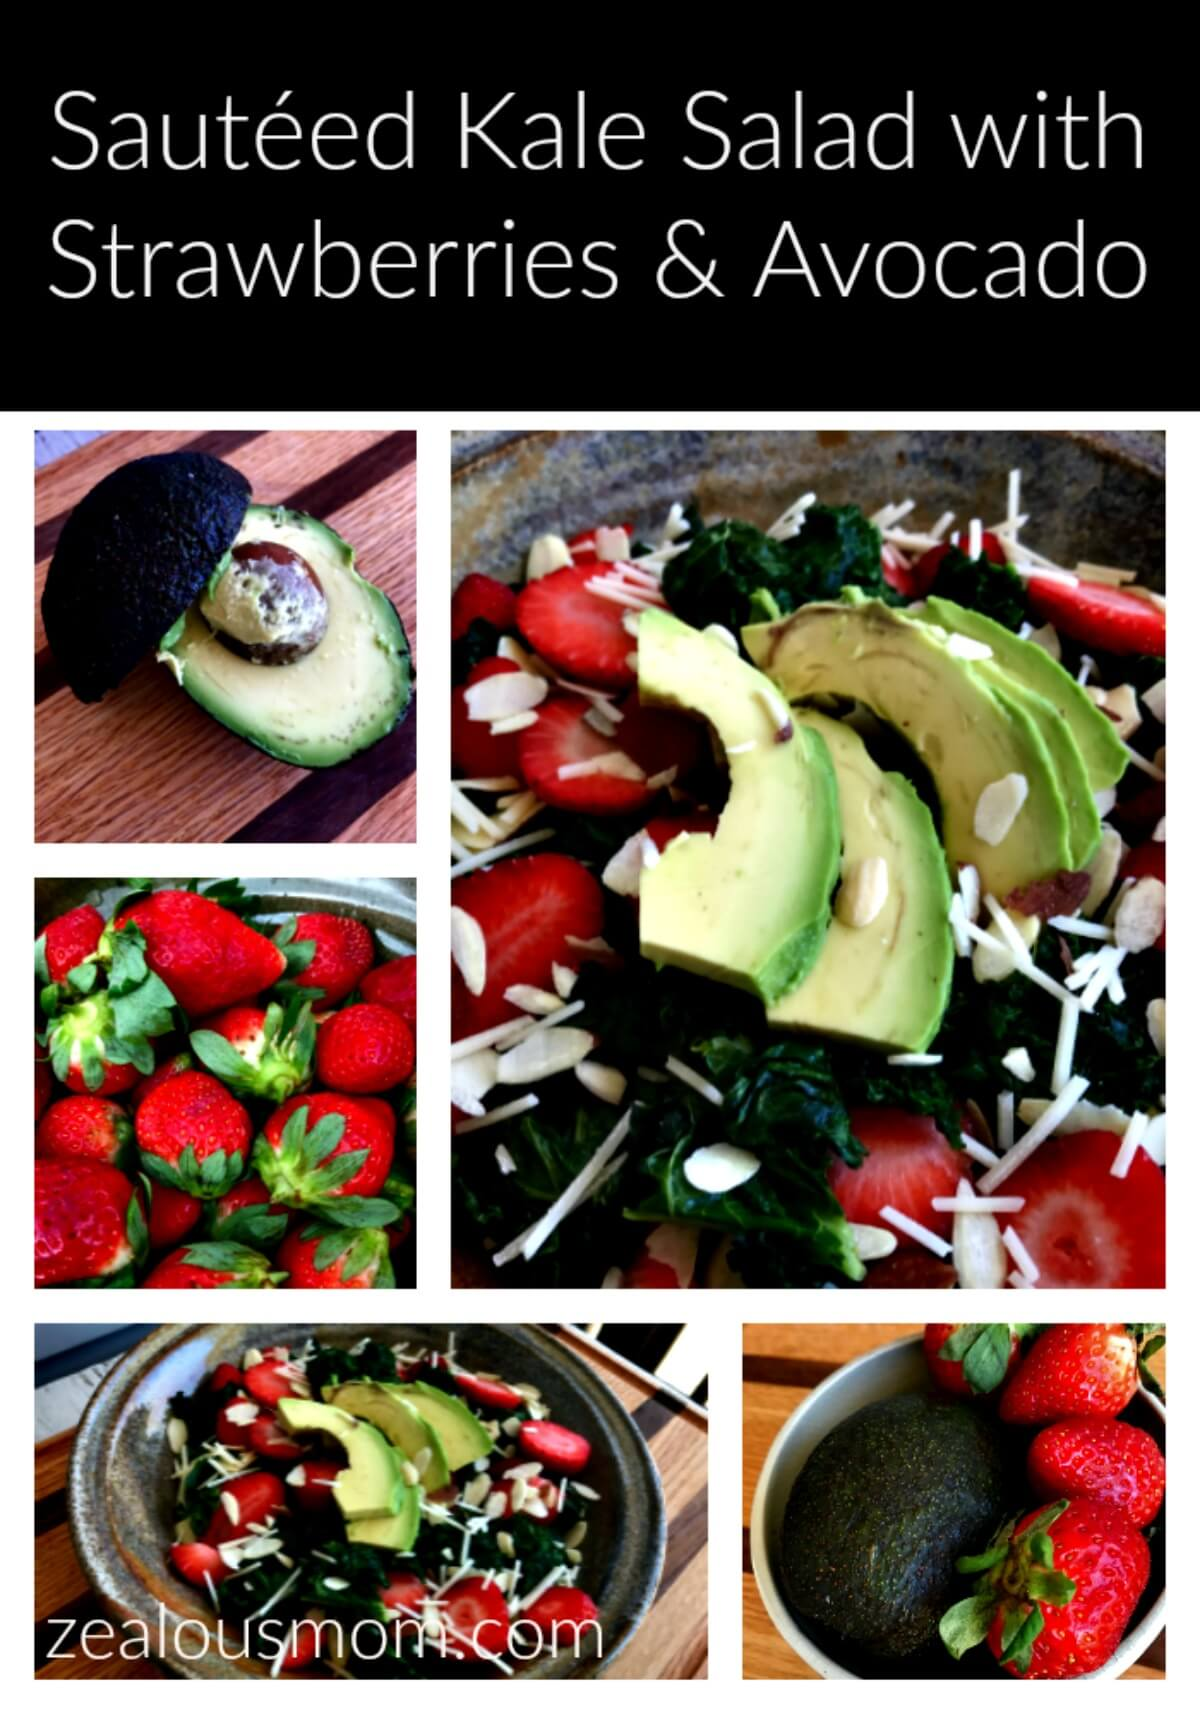 Sautéed Kale Salad with Strawberries and Avocado